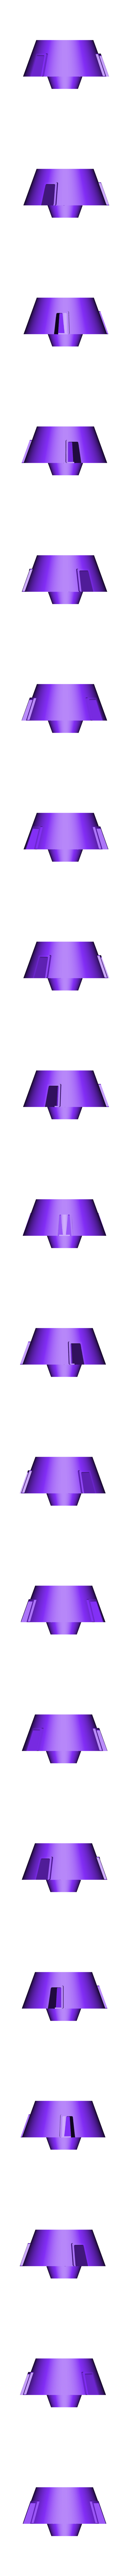 Pièce 2.STL Download STL file Translocator Sombra • 3D print model, Midnight_05